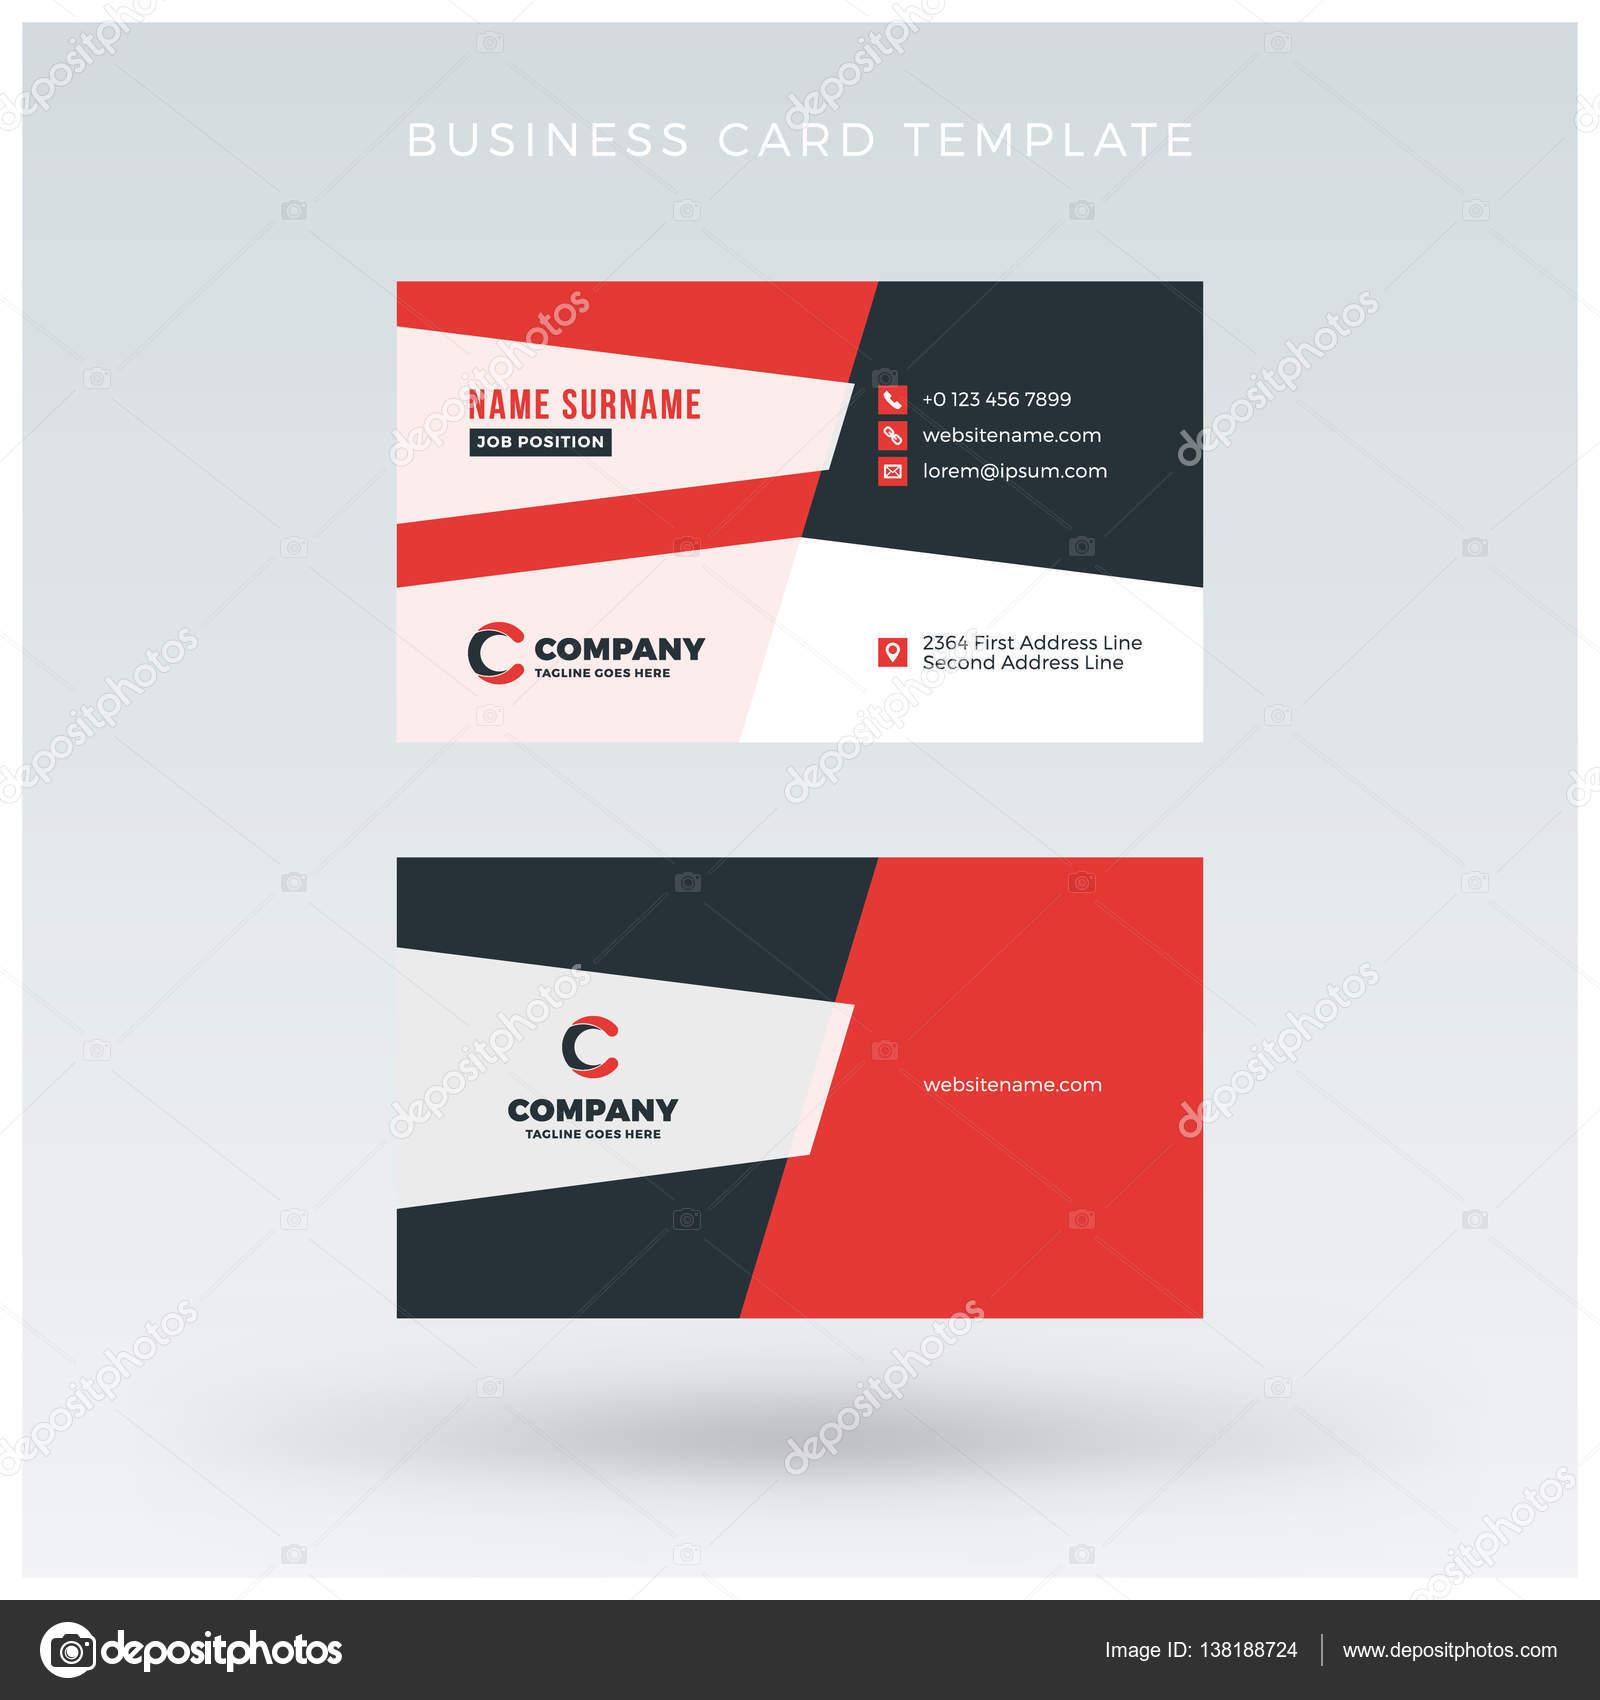 Beidseitig Rot Visitenkarte Vorlage Vektor Illustration